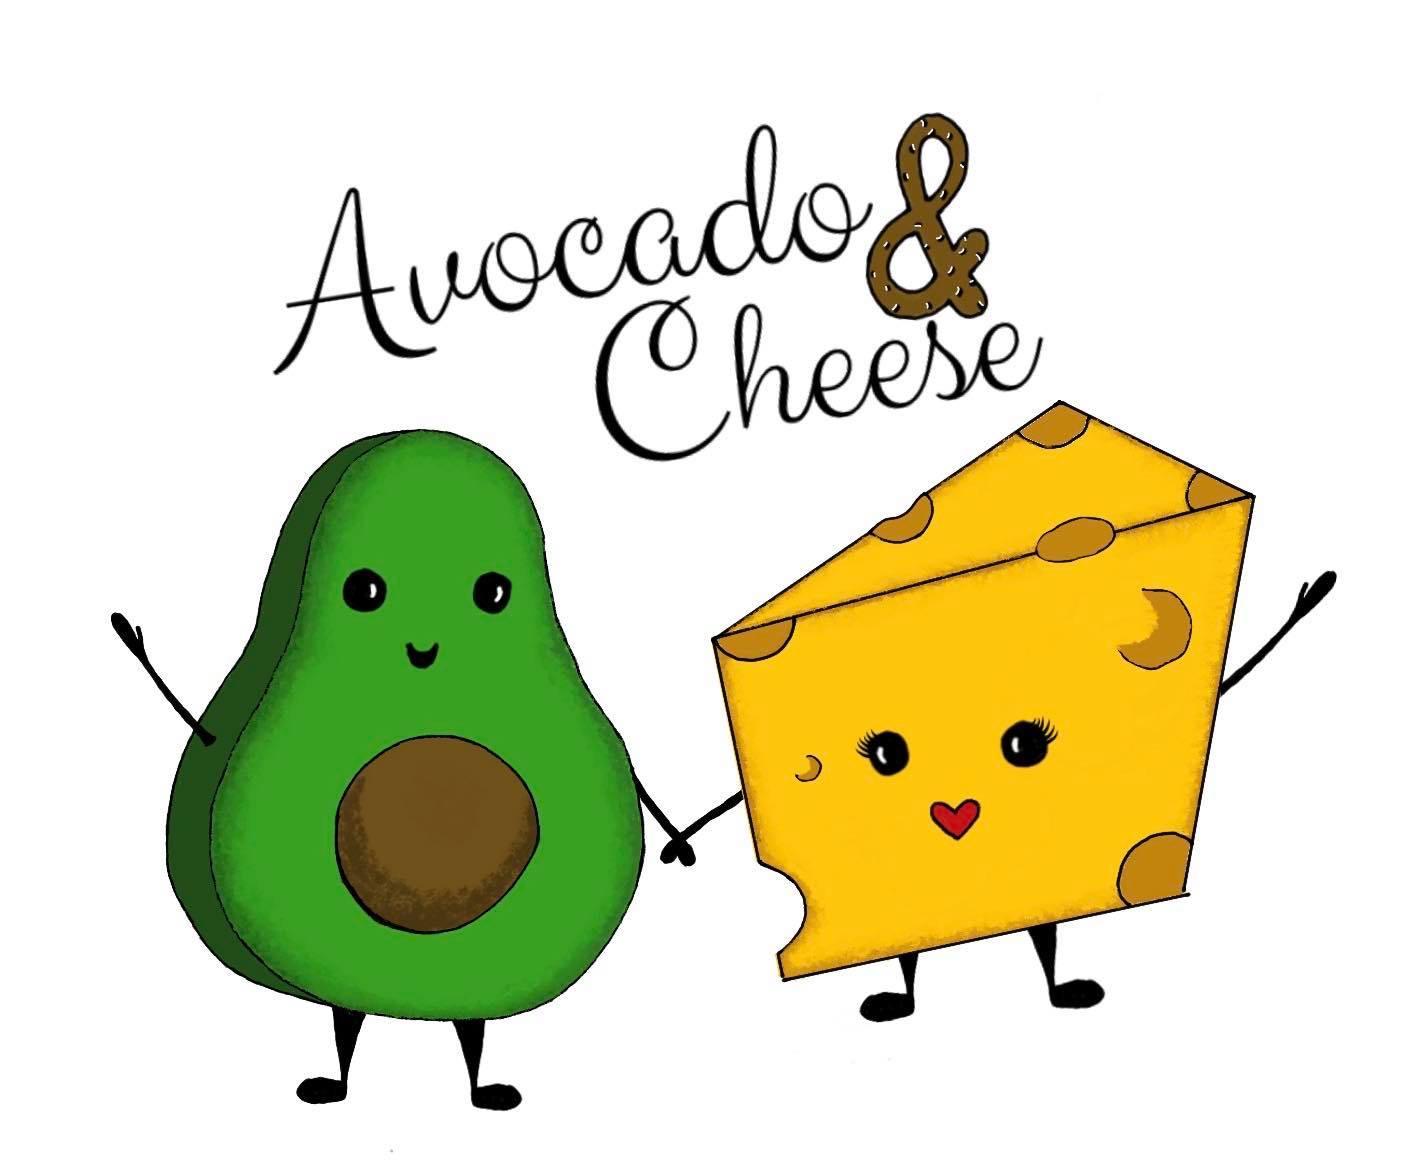 Avocado and Cheese, LLC logo